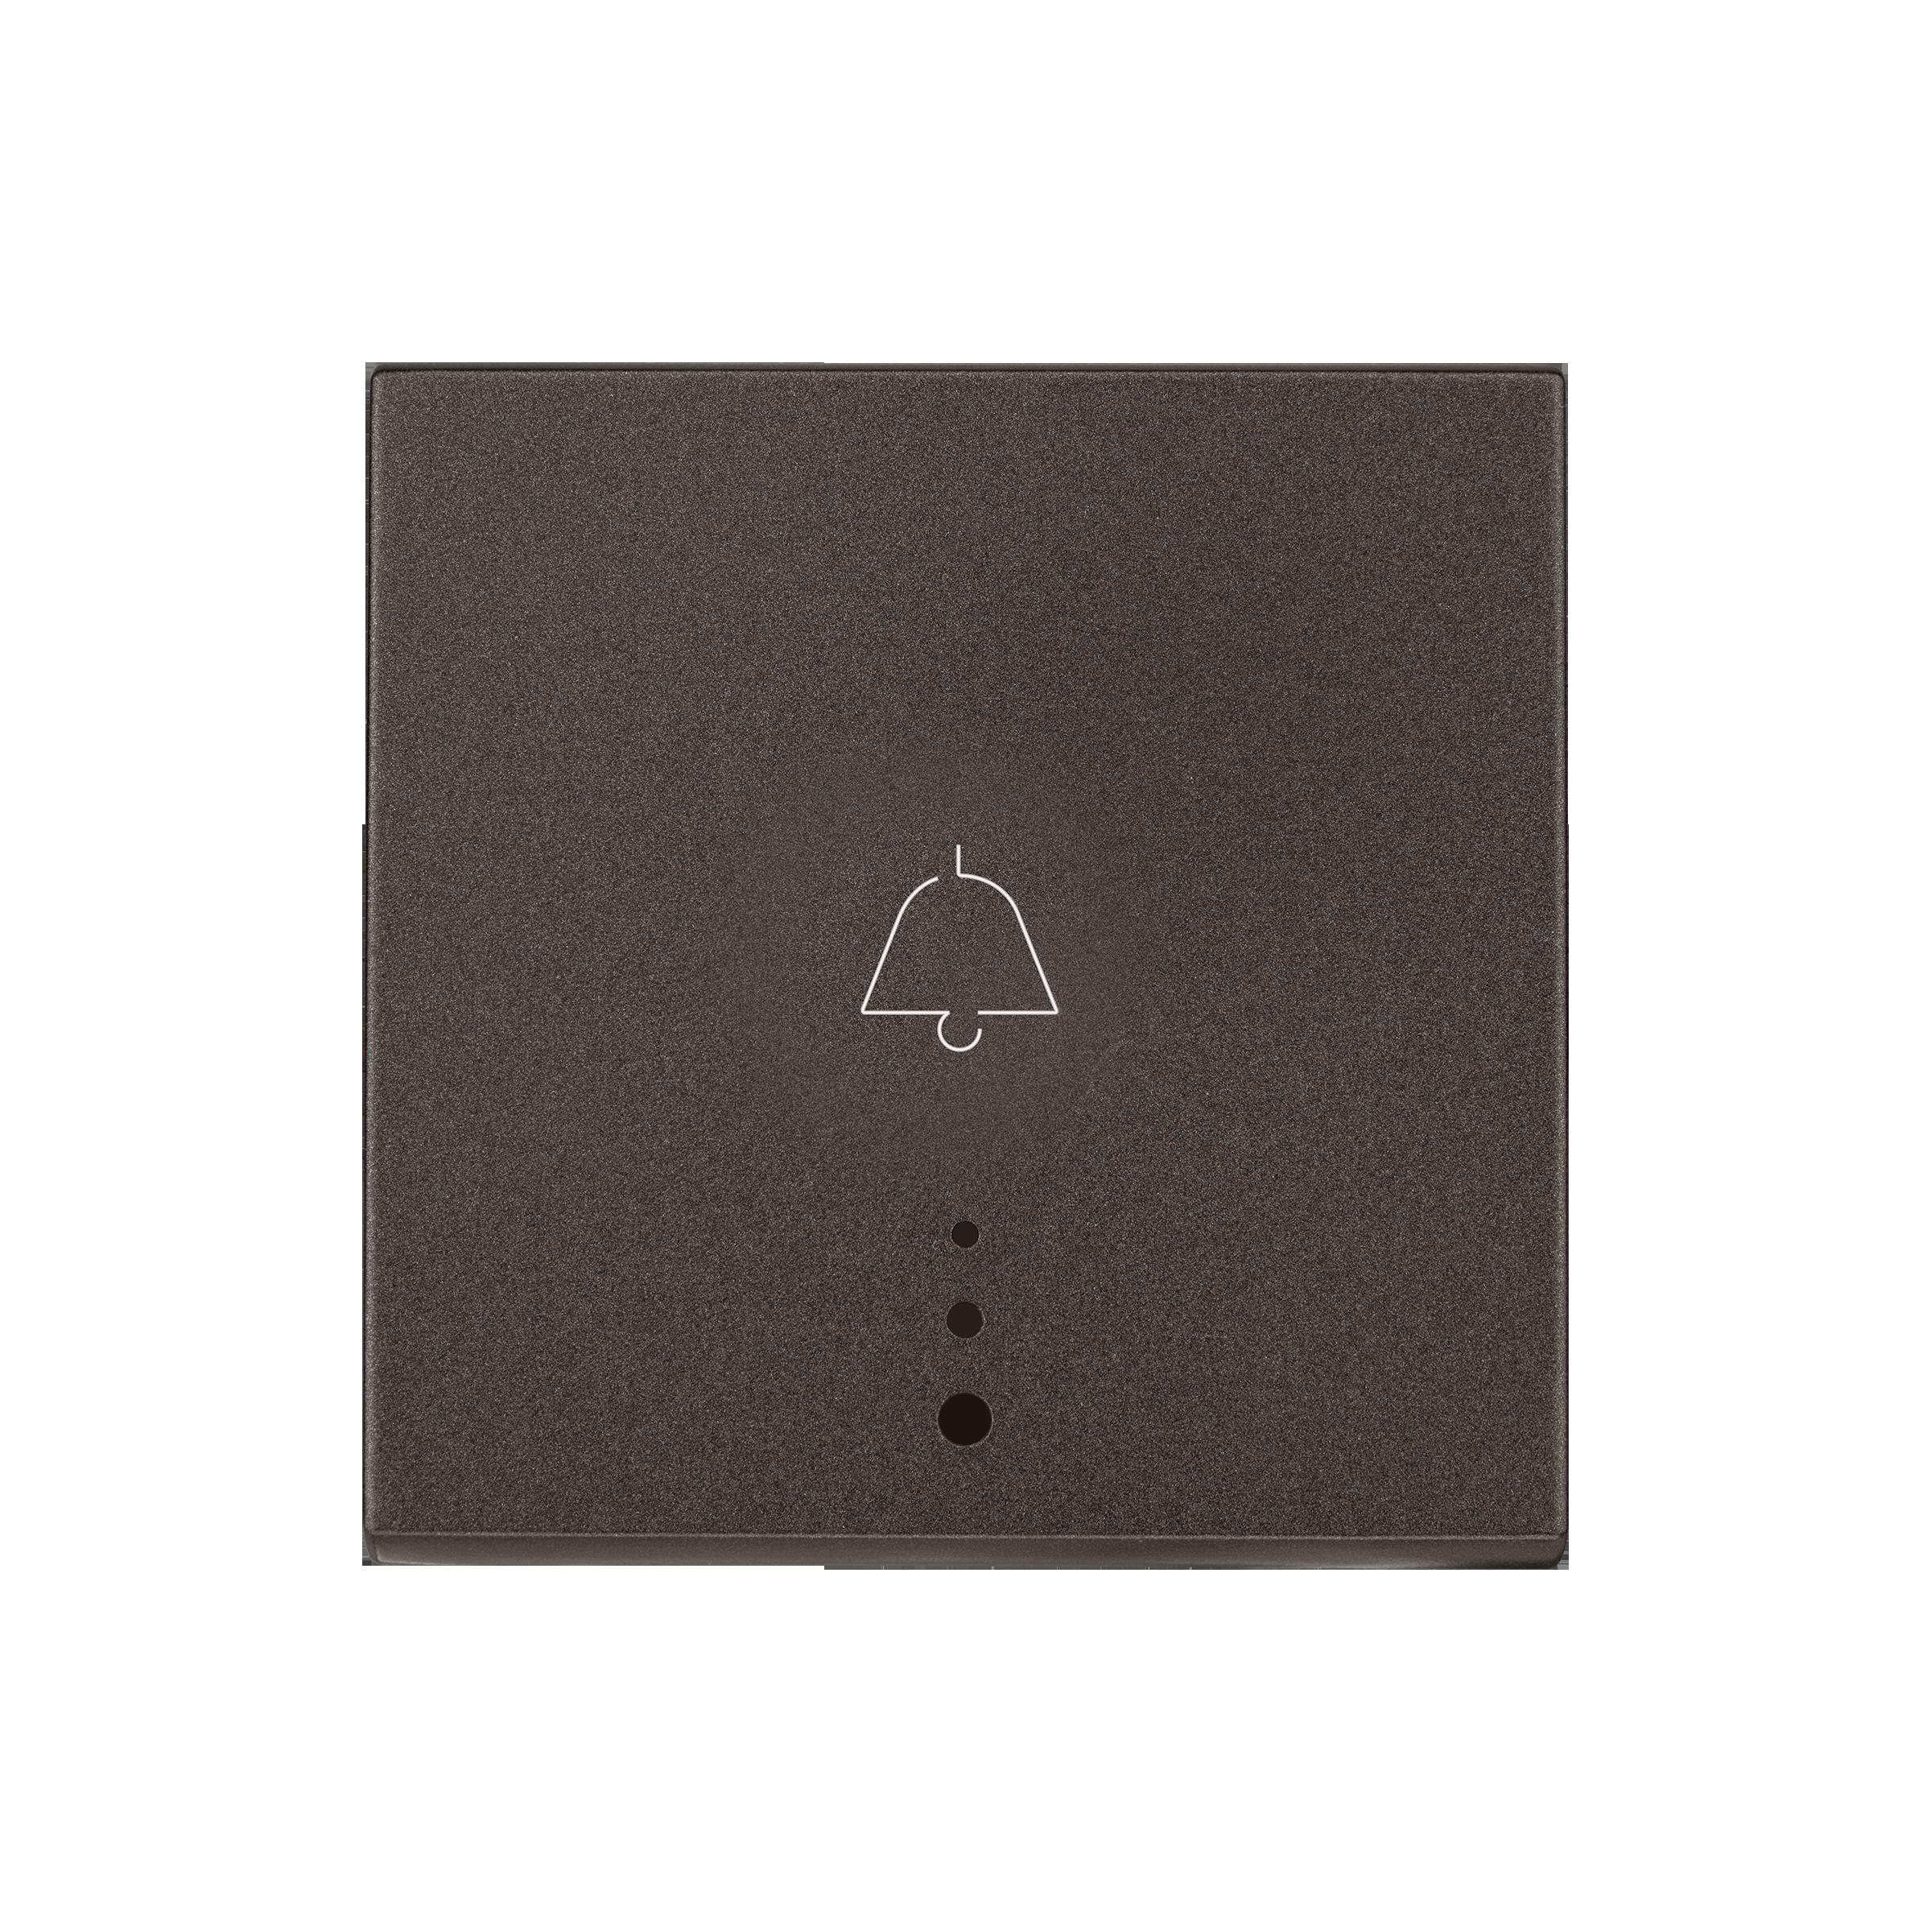 Myrius Nextgen 6A Bell Push1 Way 2M With Indicator Charcoal Grey